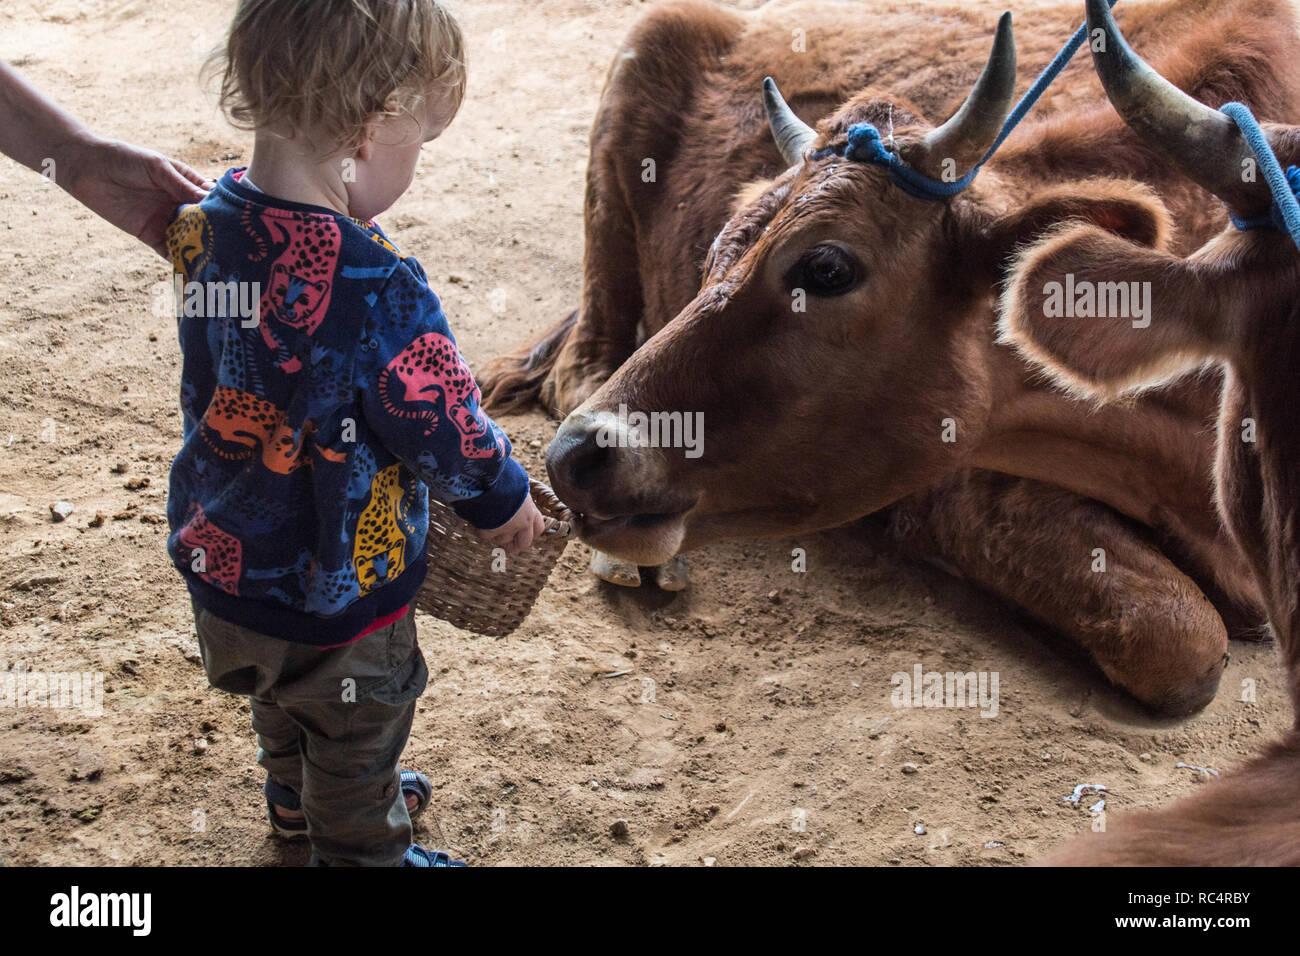 A photo of a baby boy feeding an ox - Stock Image